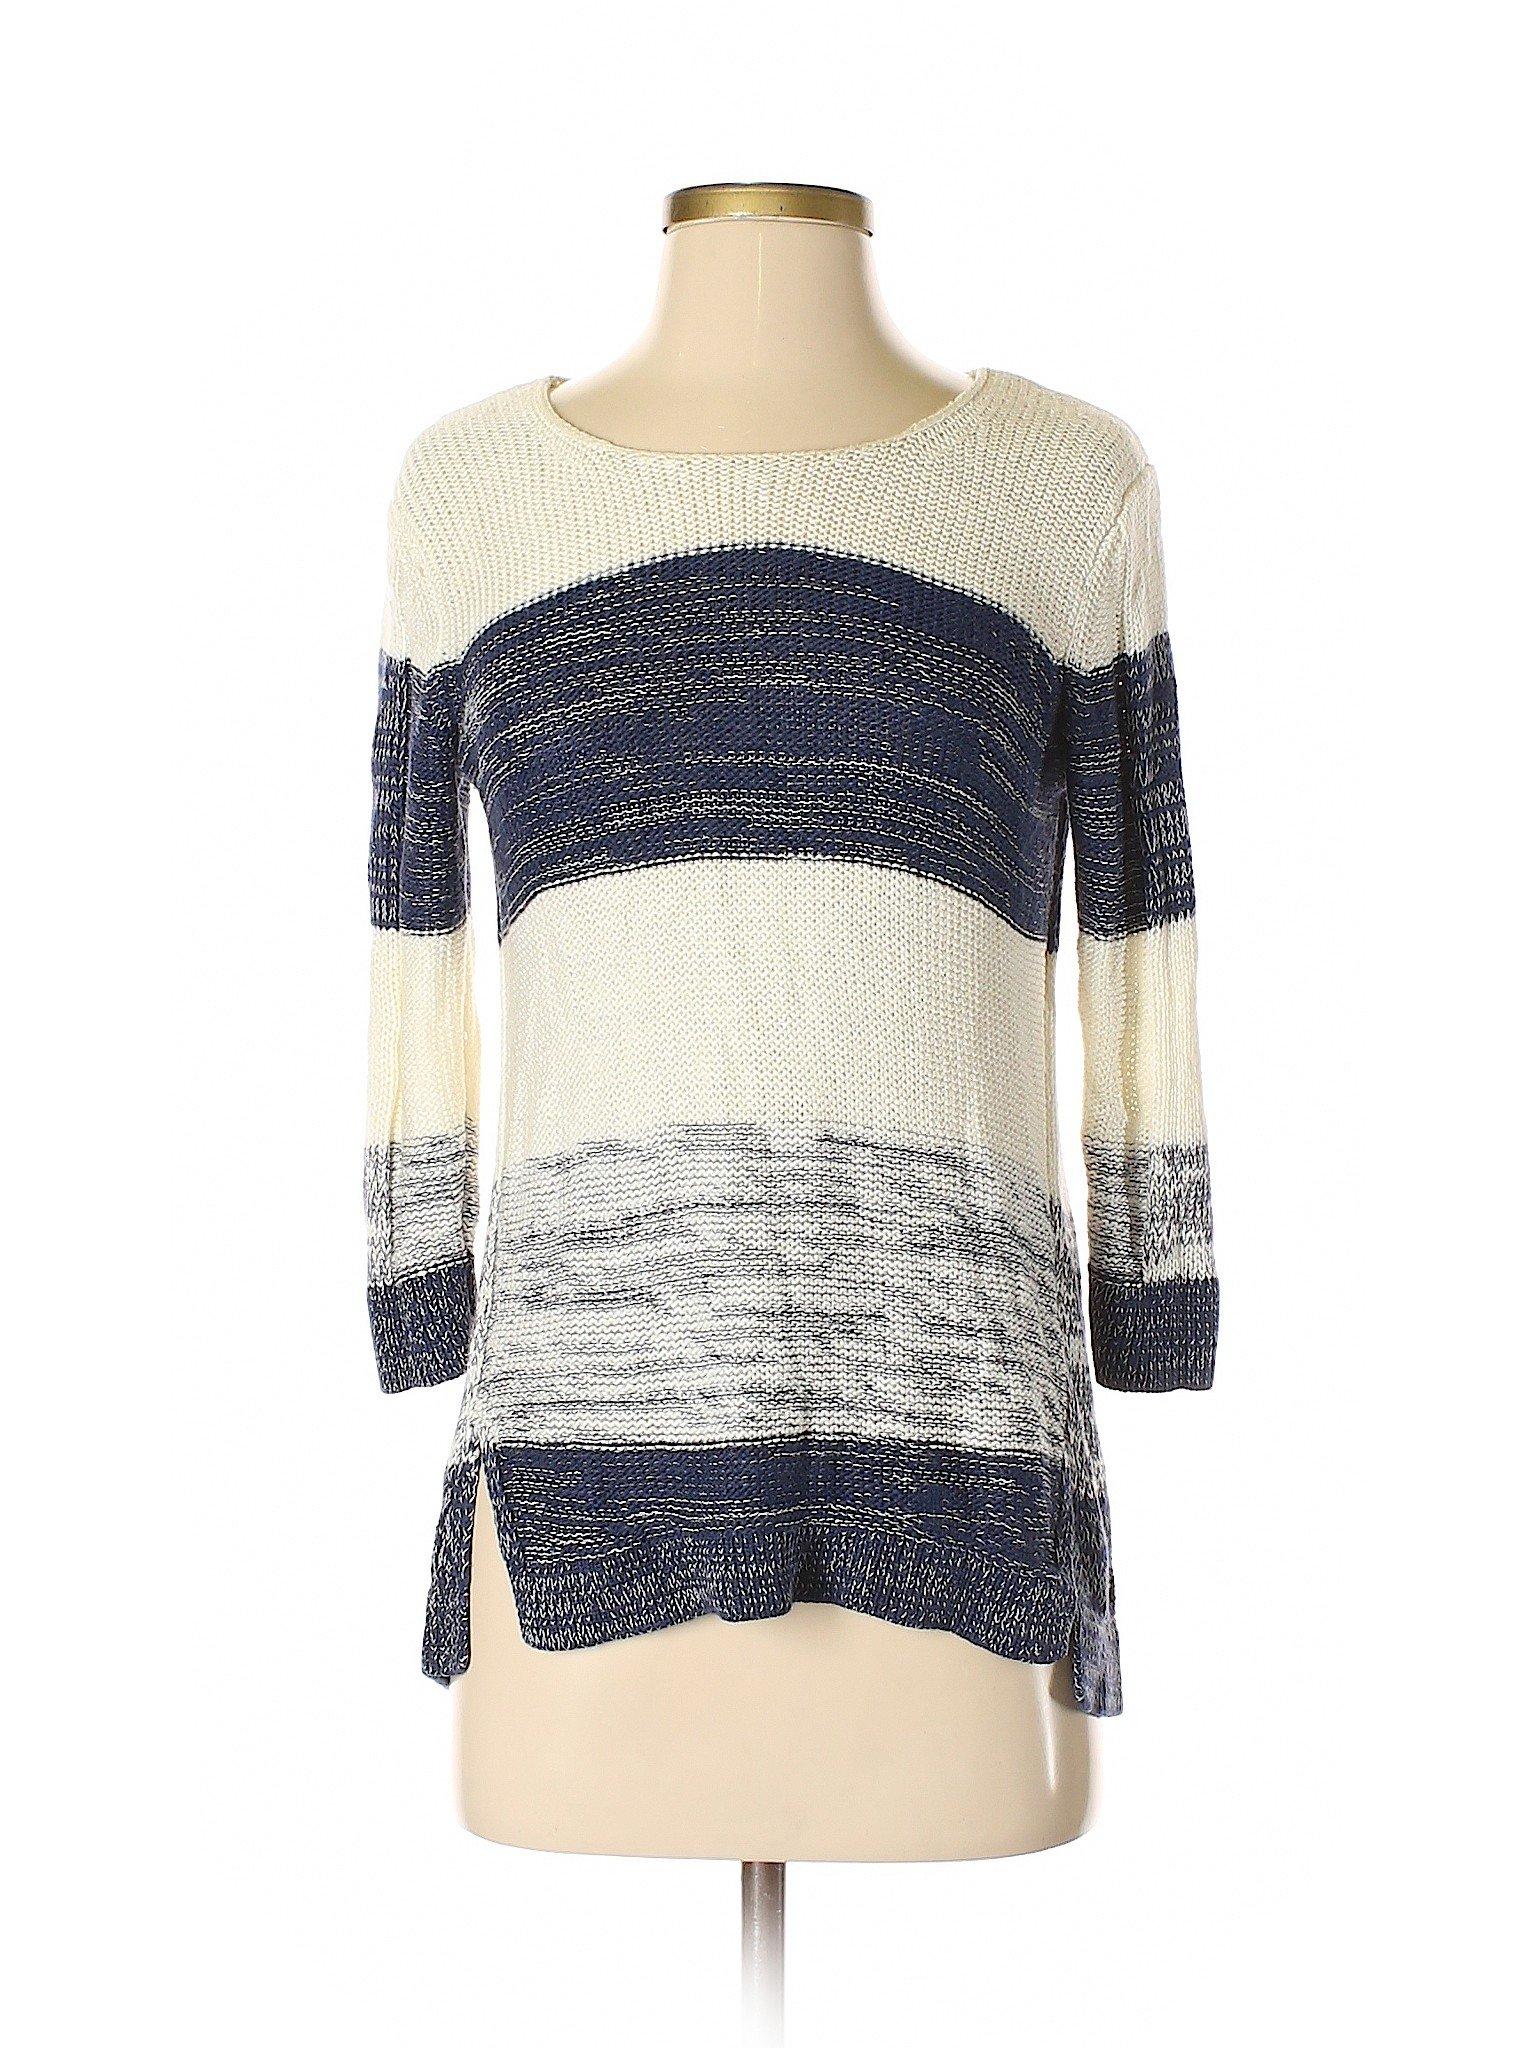 Boutique Winter Pullover Sweater Winter Gap Boutique Gap wqp7gxnB5